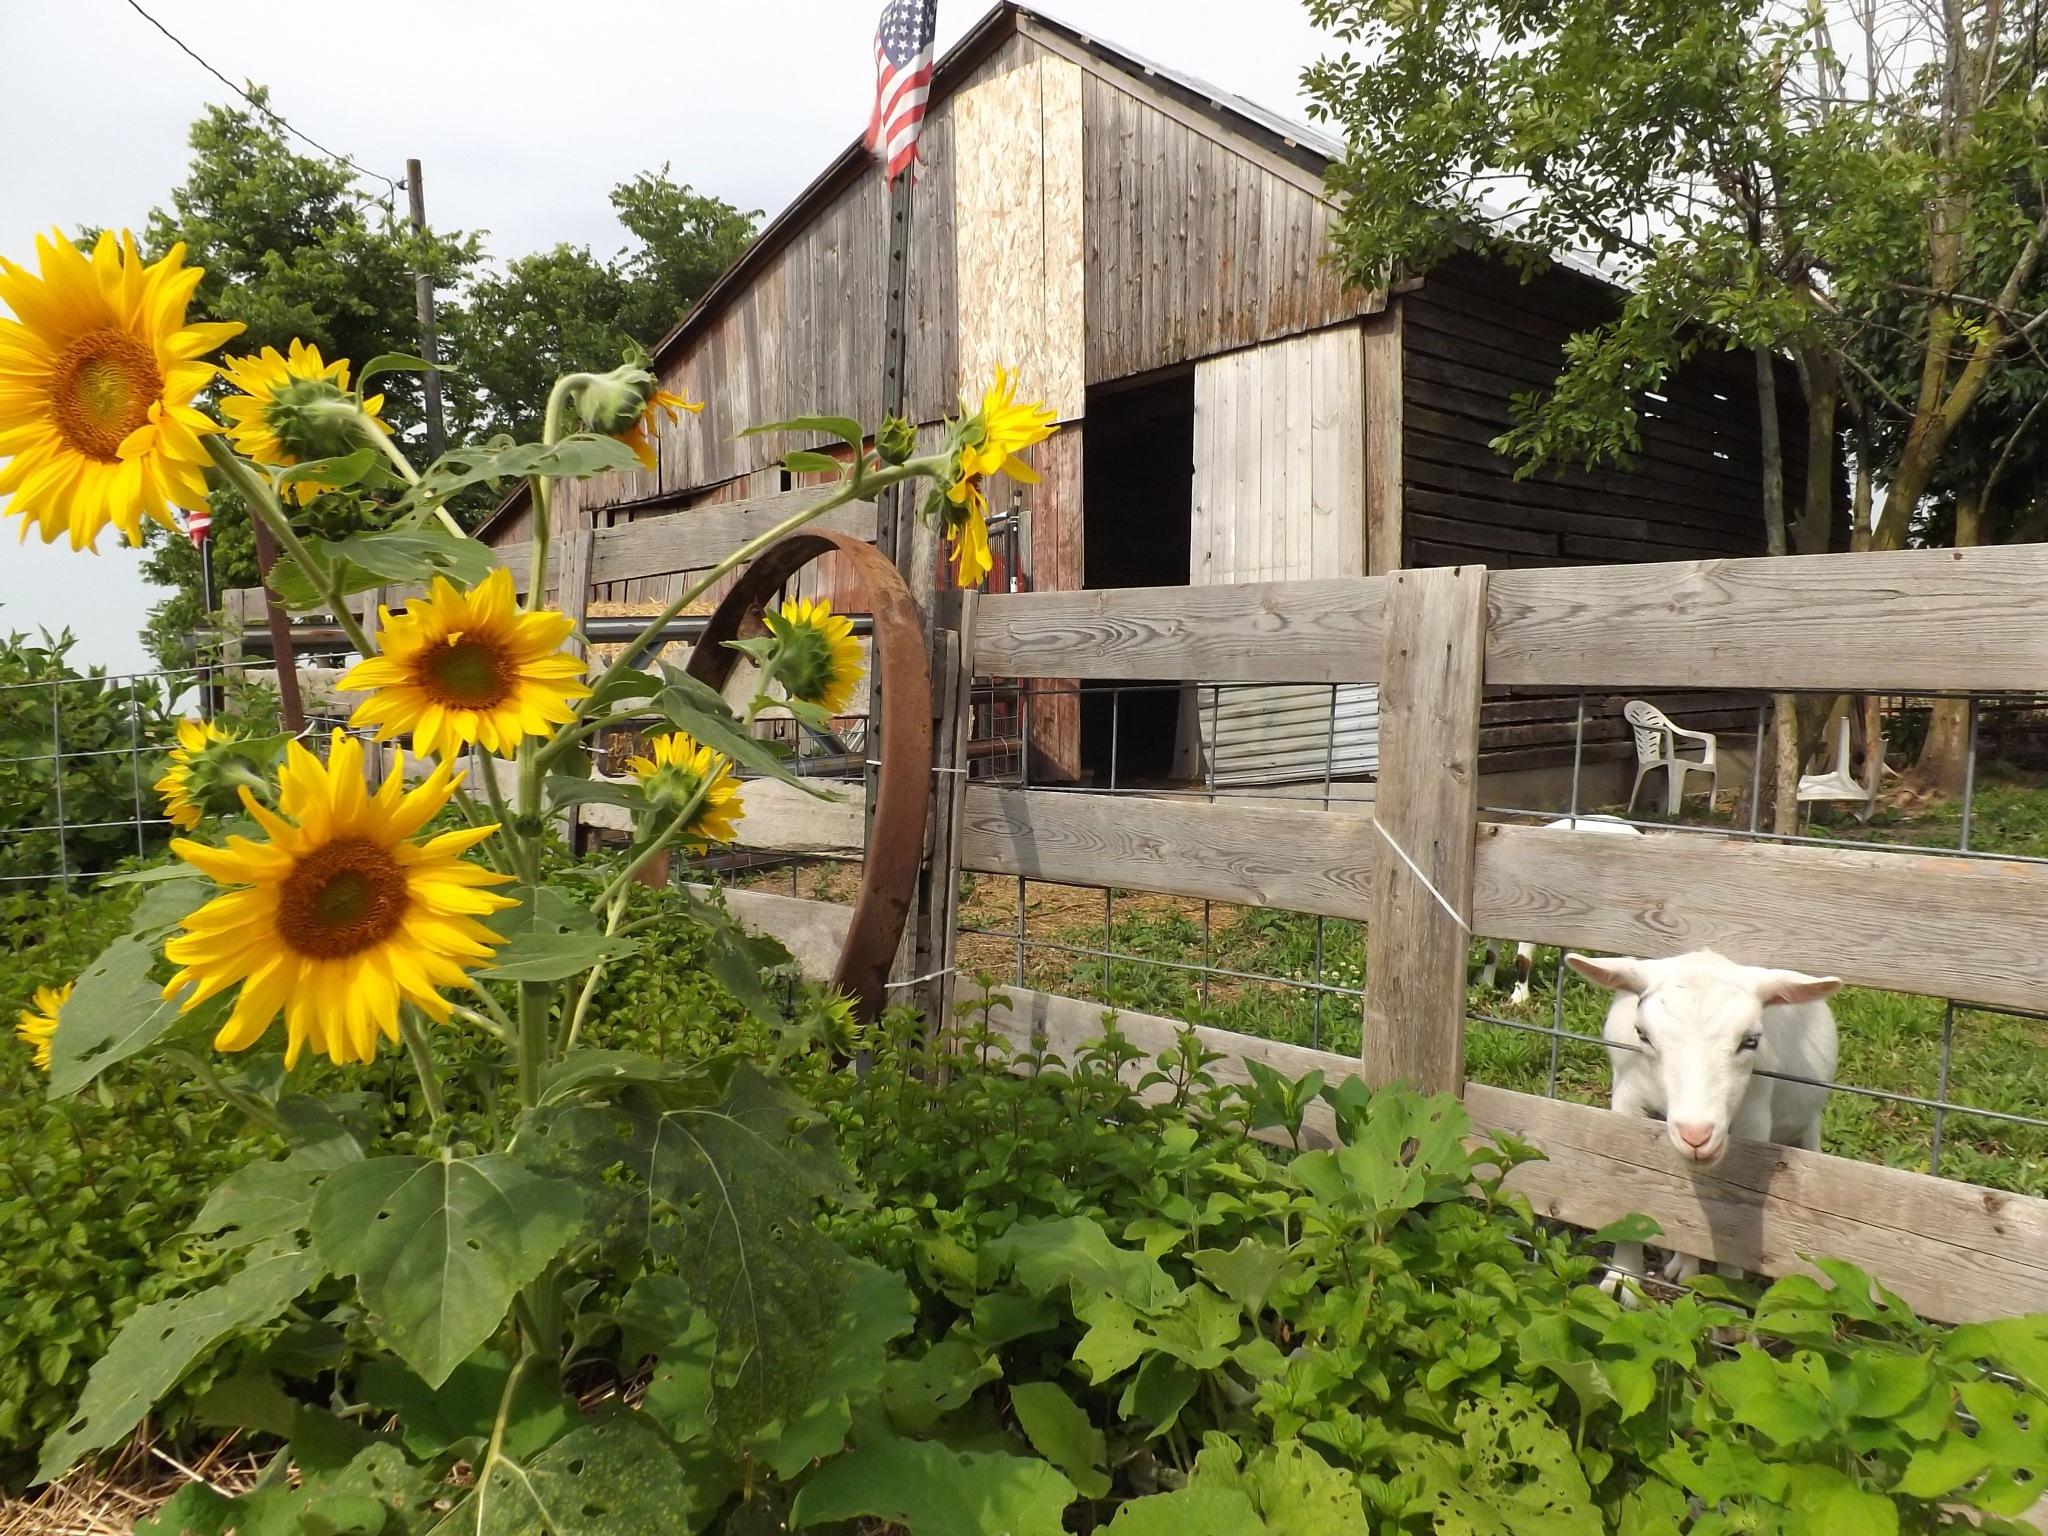 Home on the Farm by KimDonavan